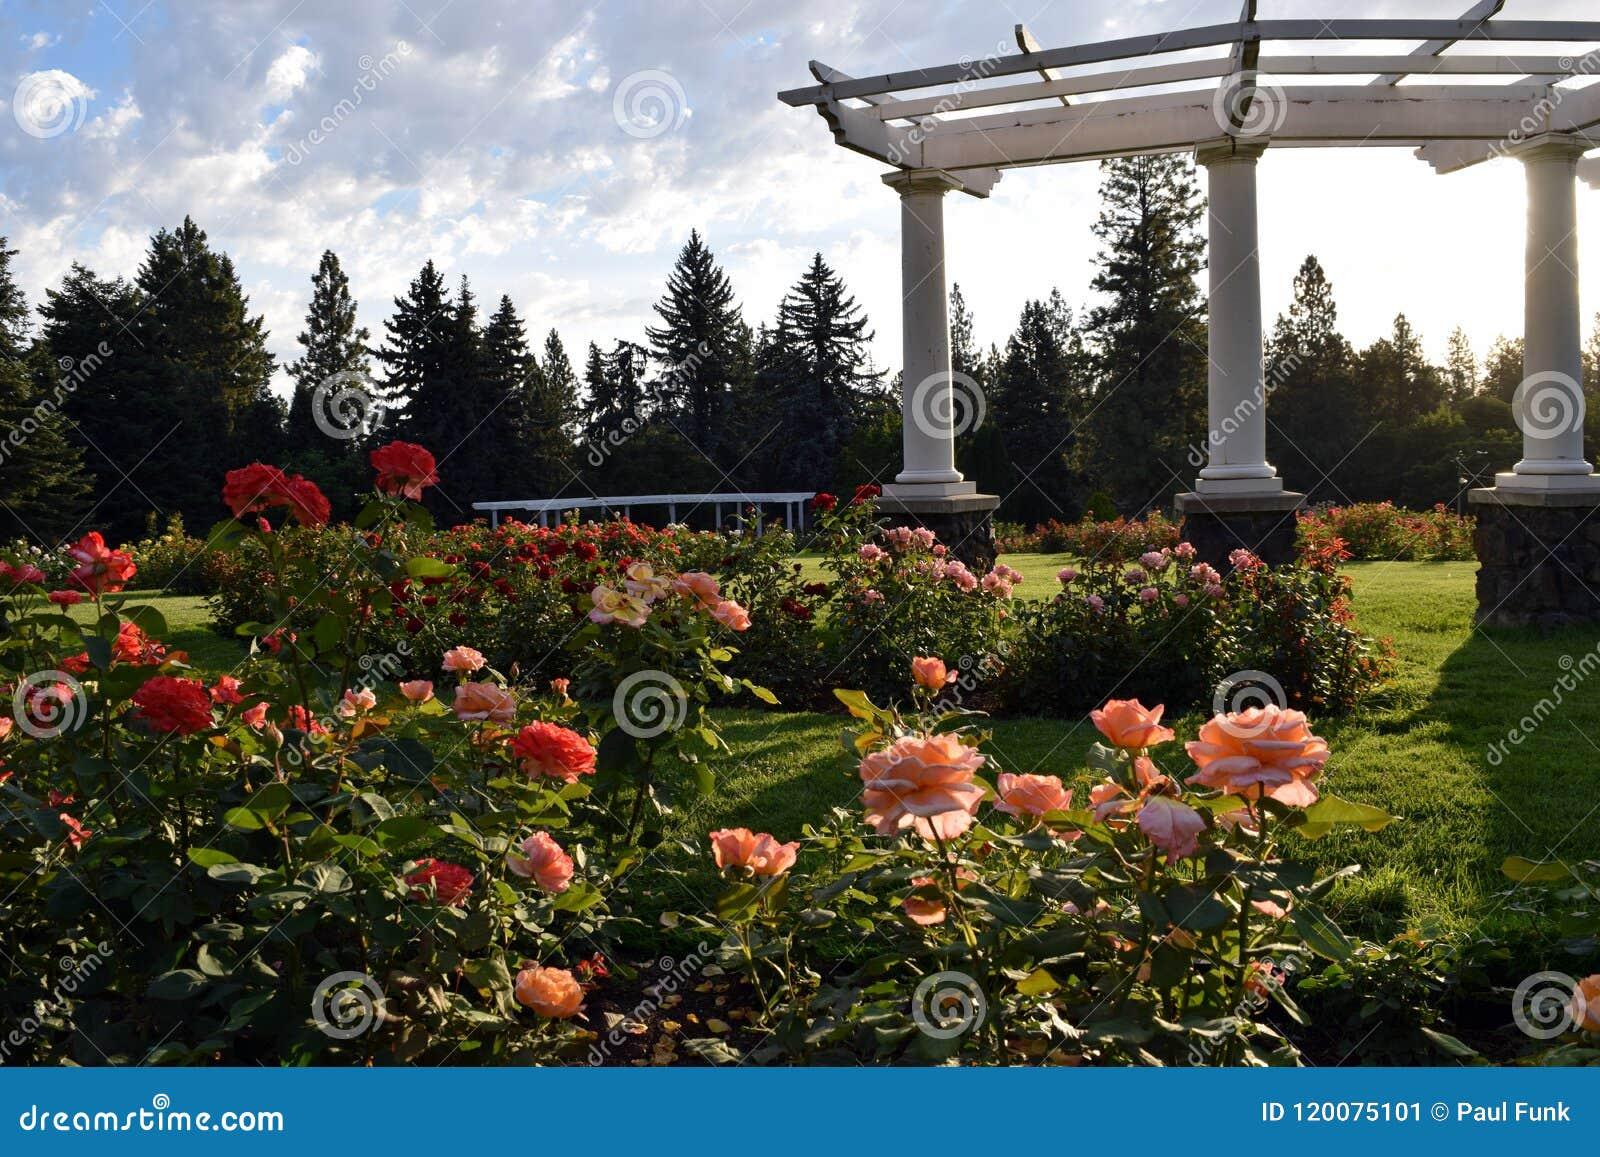 Rose Garden Pine Trees Corinthian Column Pergola Stock Image - Image ...